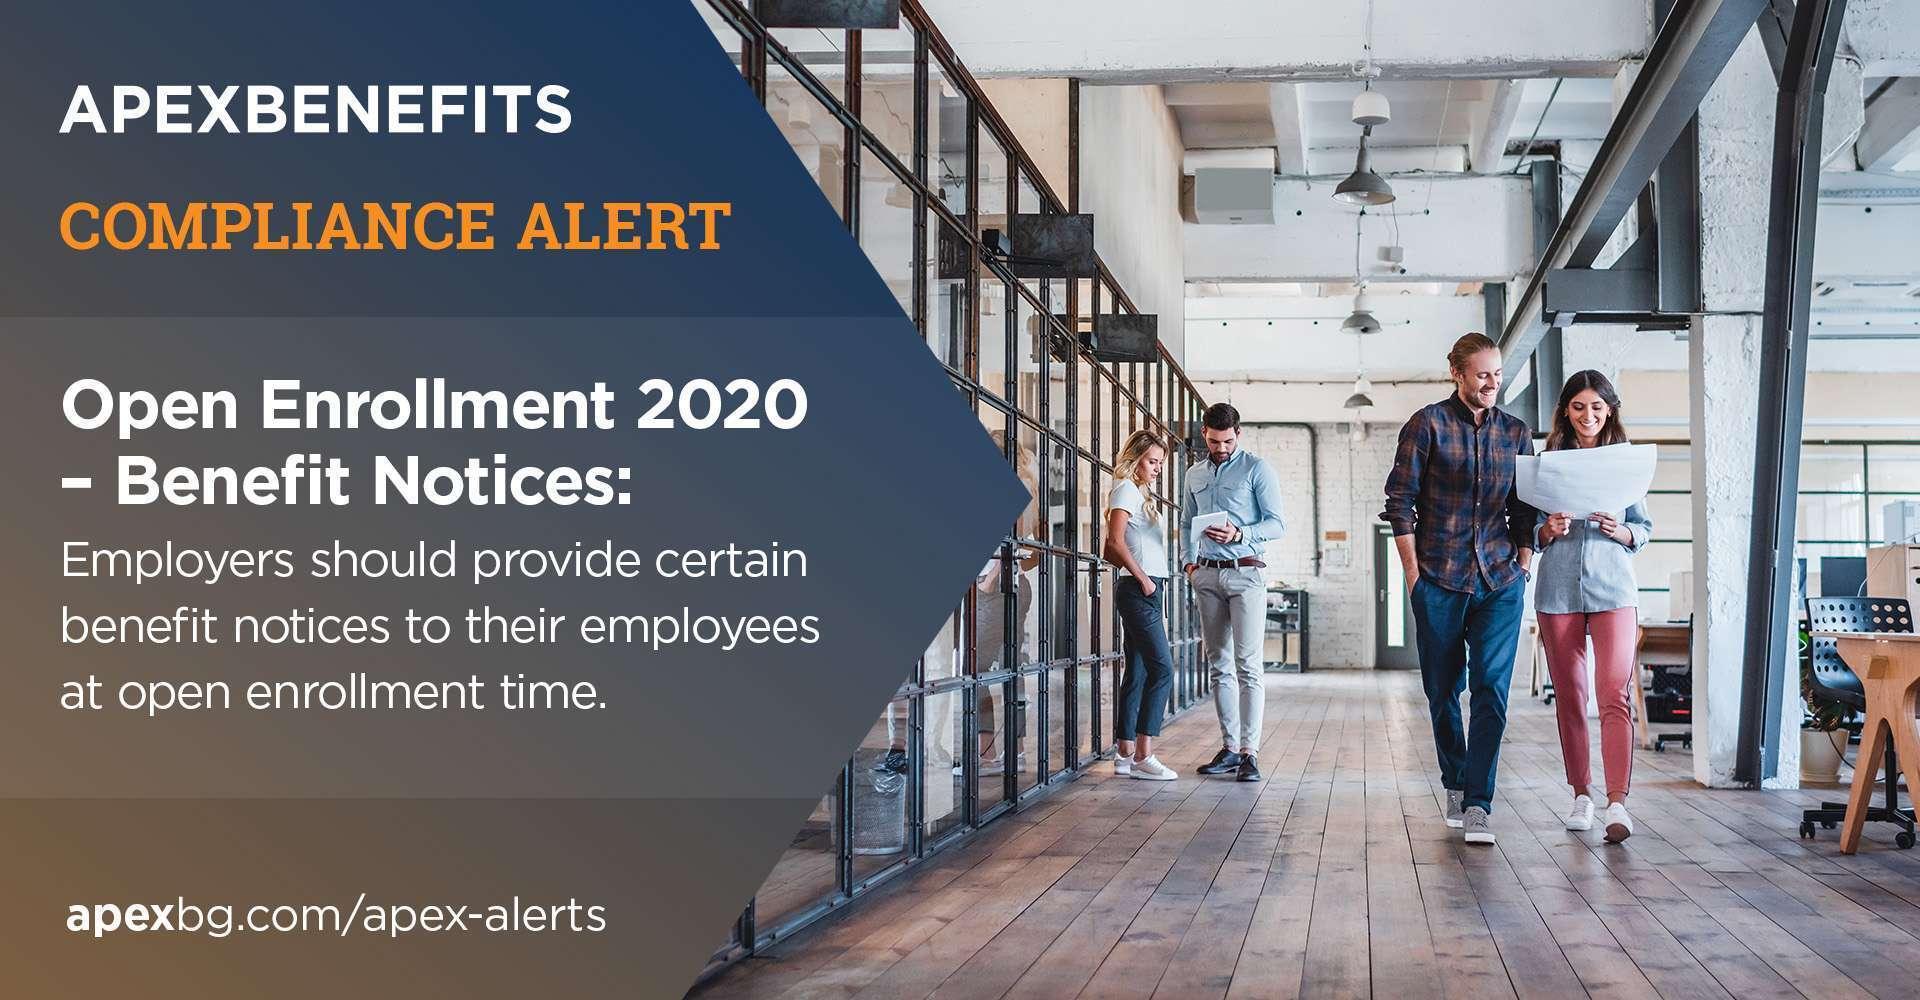 Compliance Alert: Open Enrollment 2020 – Benefits Notices